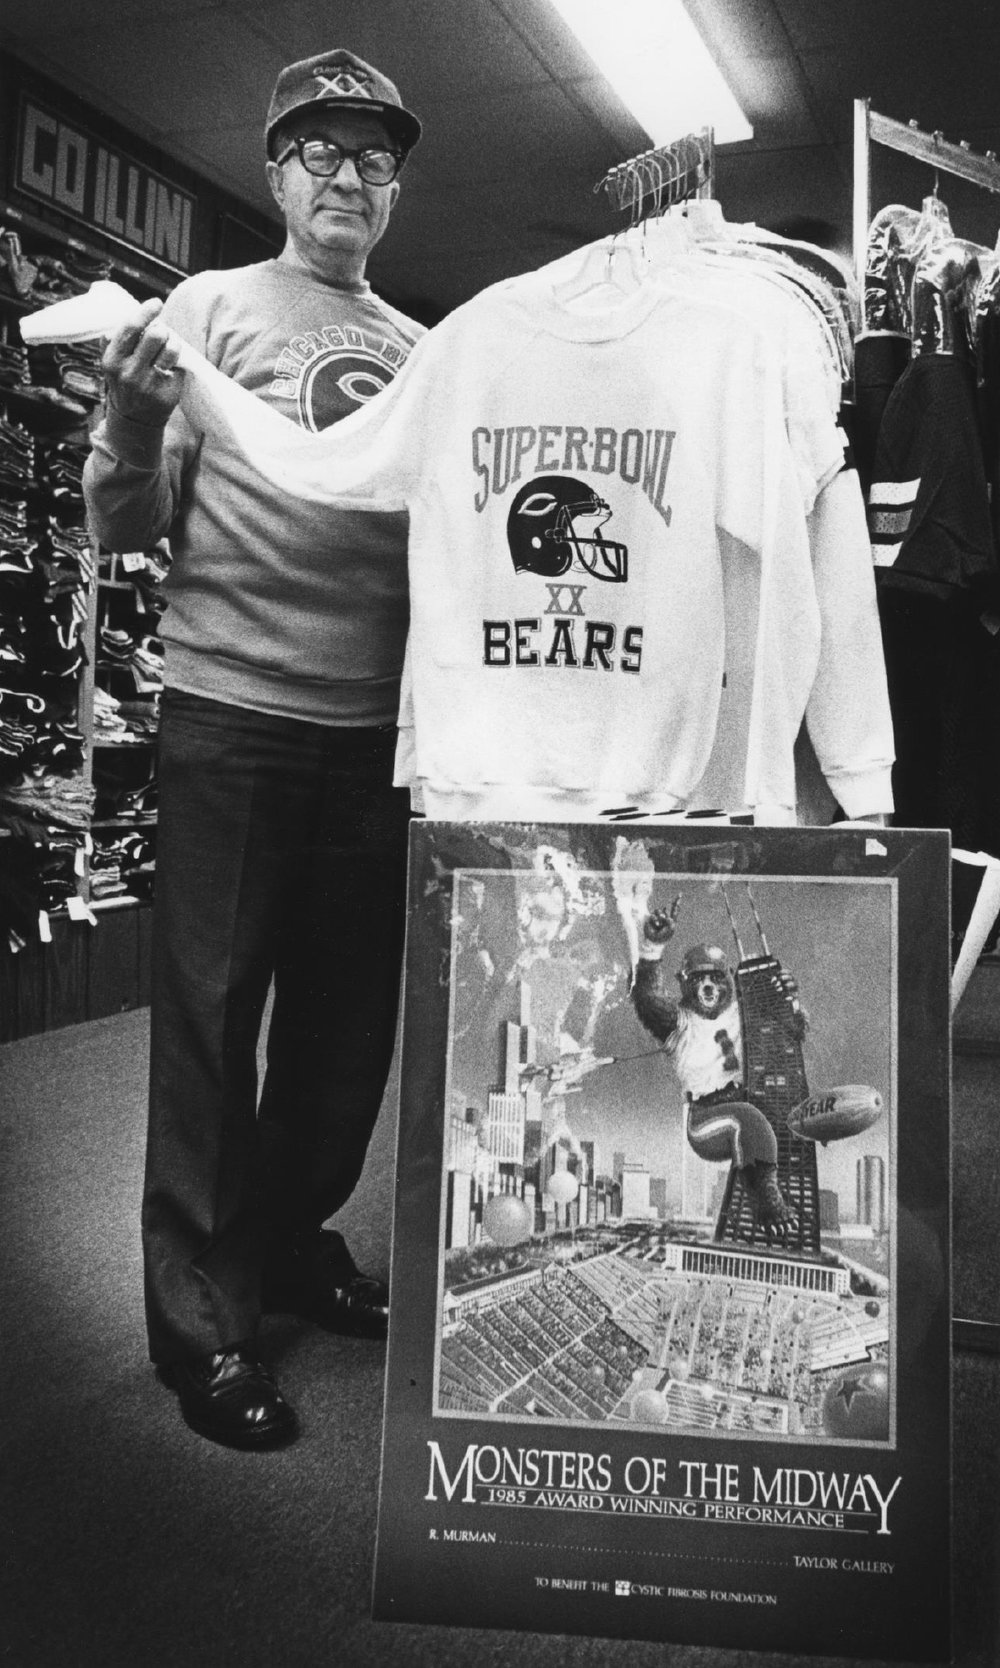 Tom's Grandfather and Super Bowl Sweatshirt